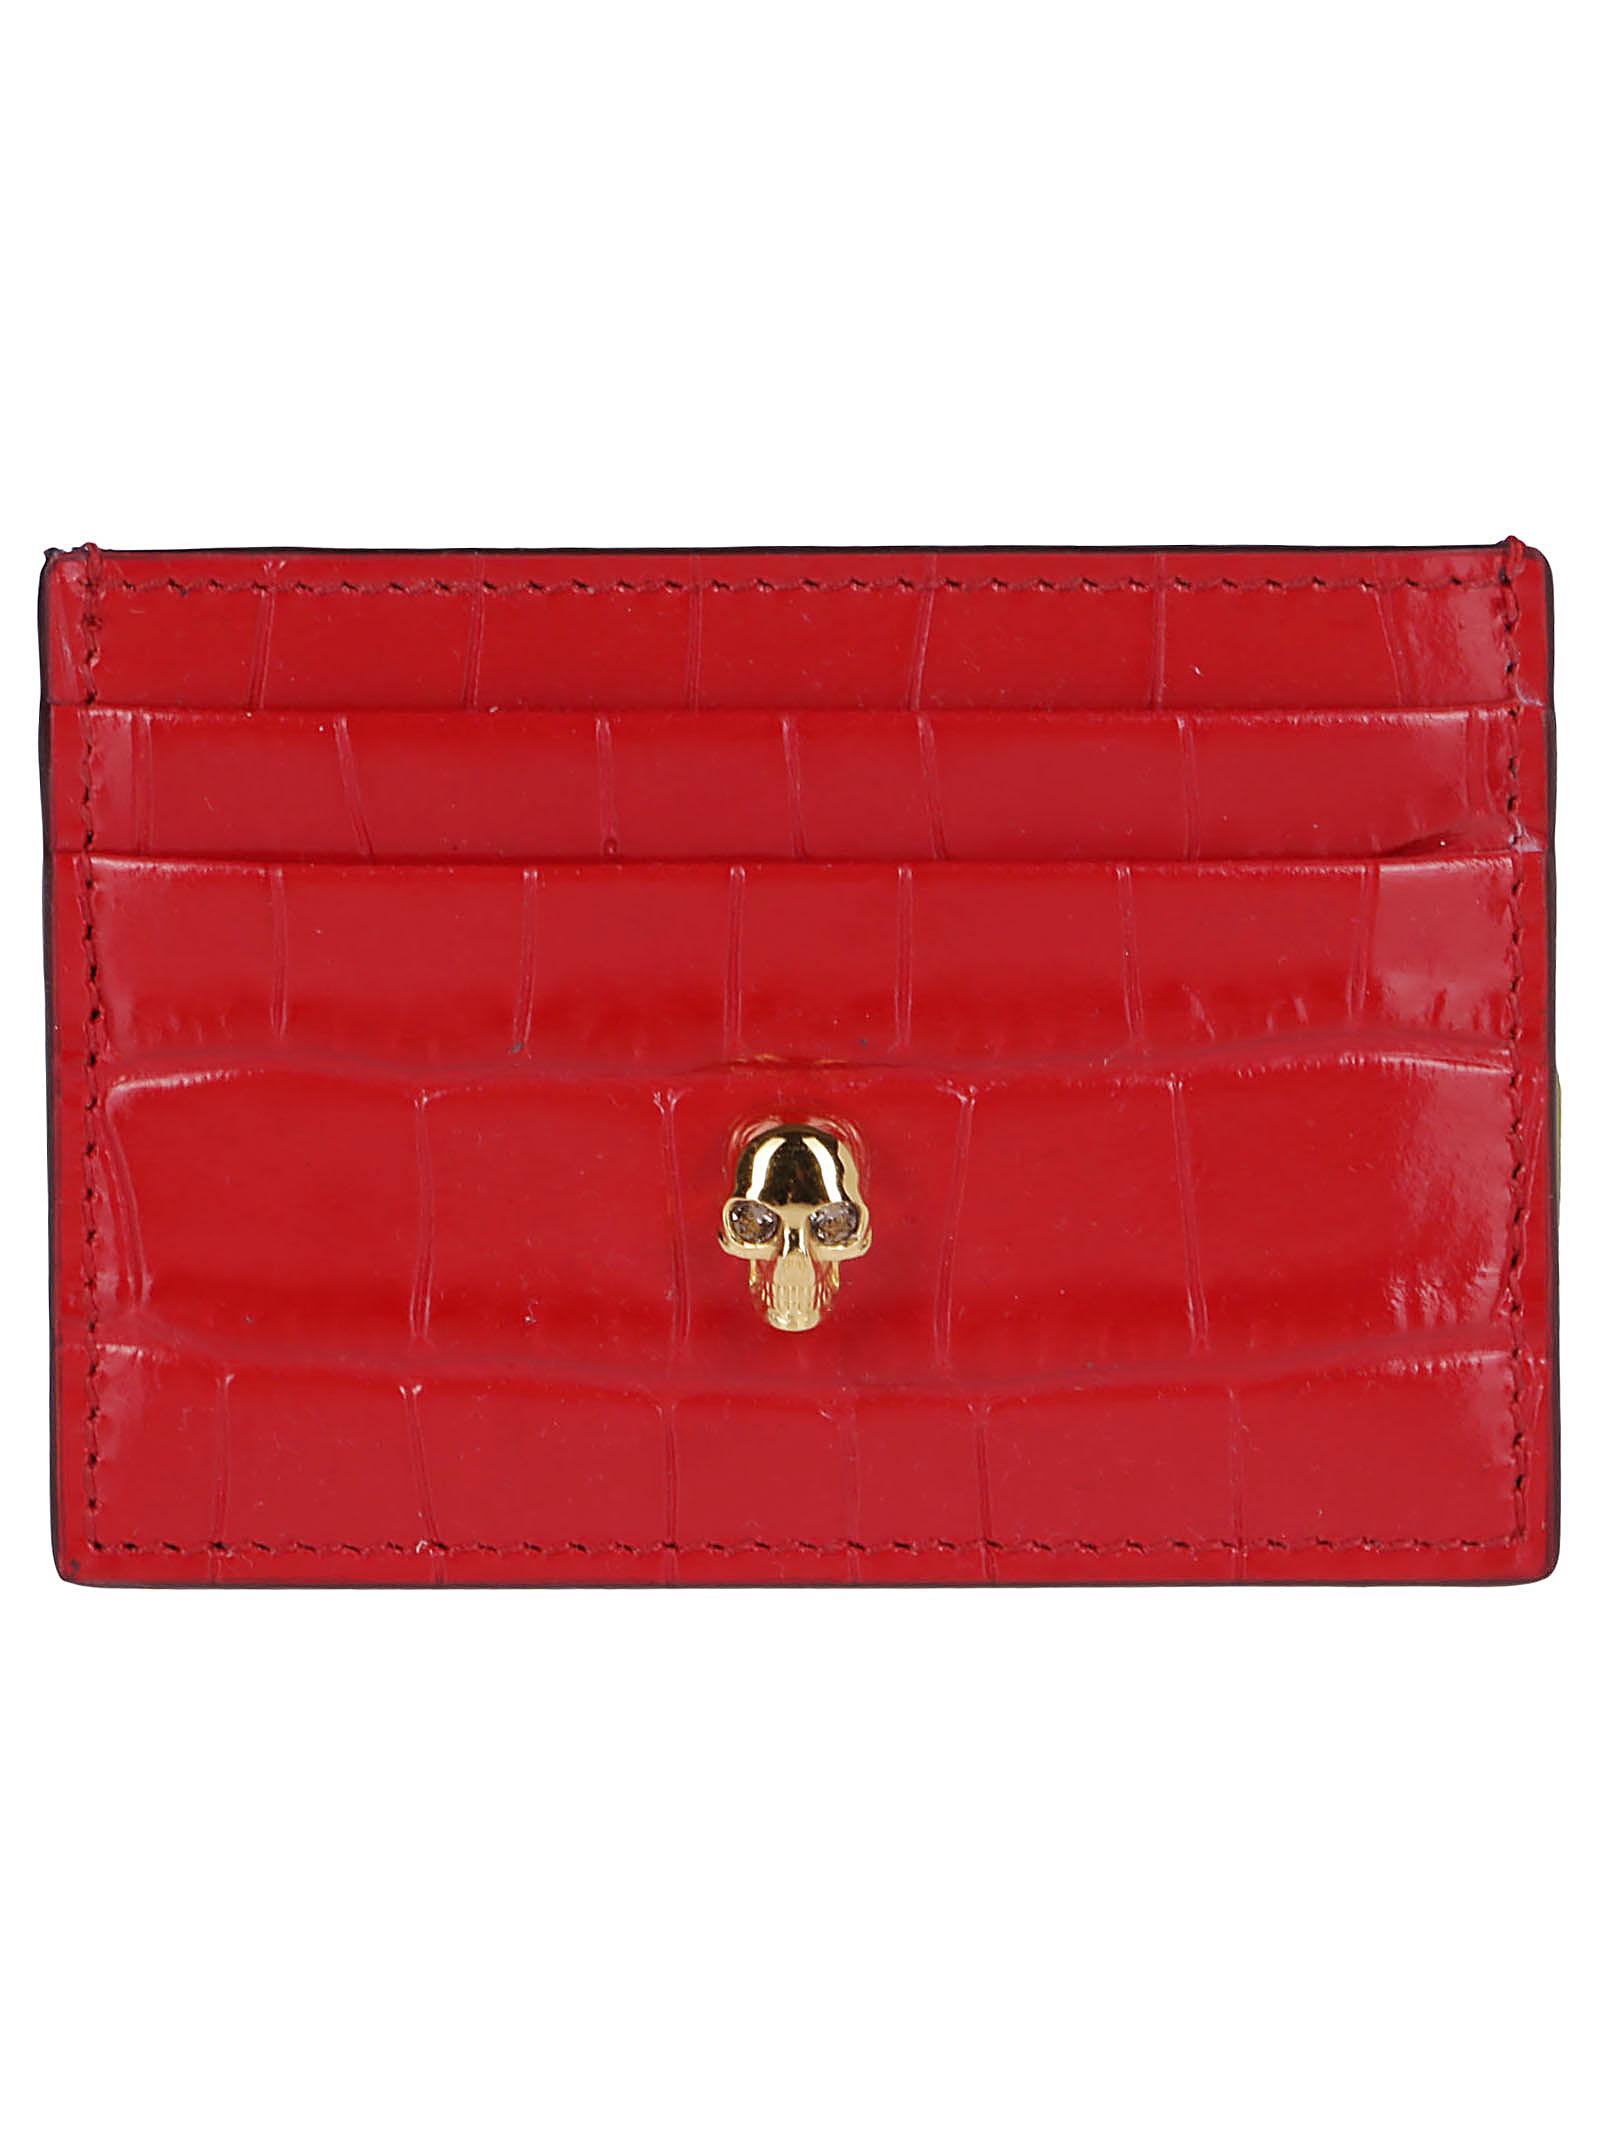 Red Leather Cardholder